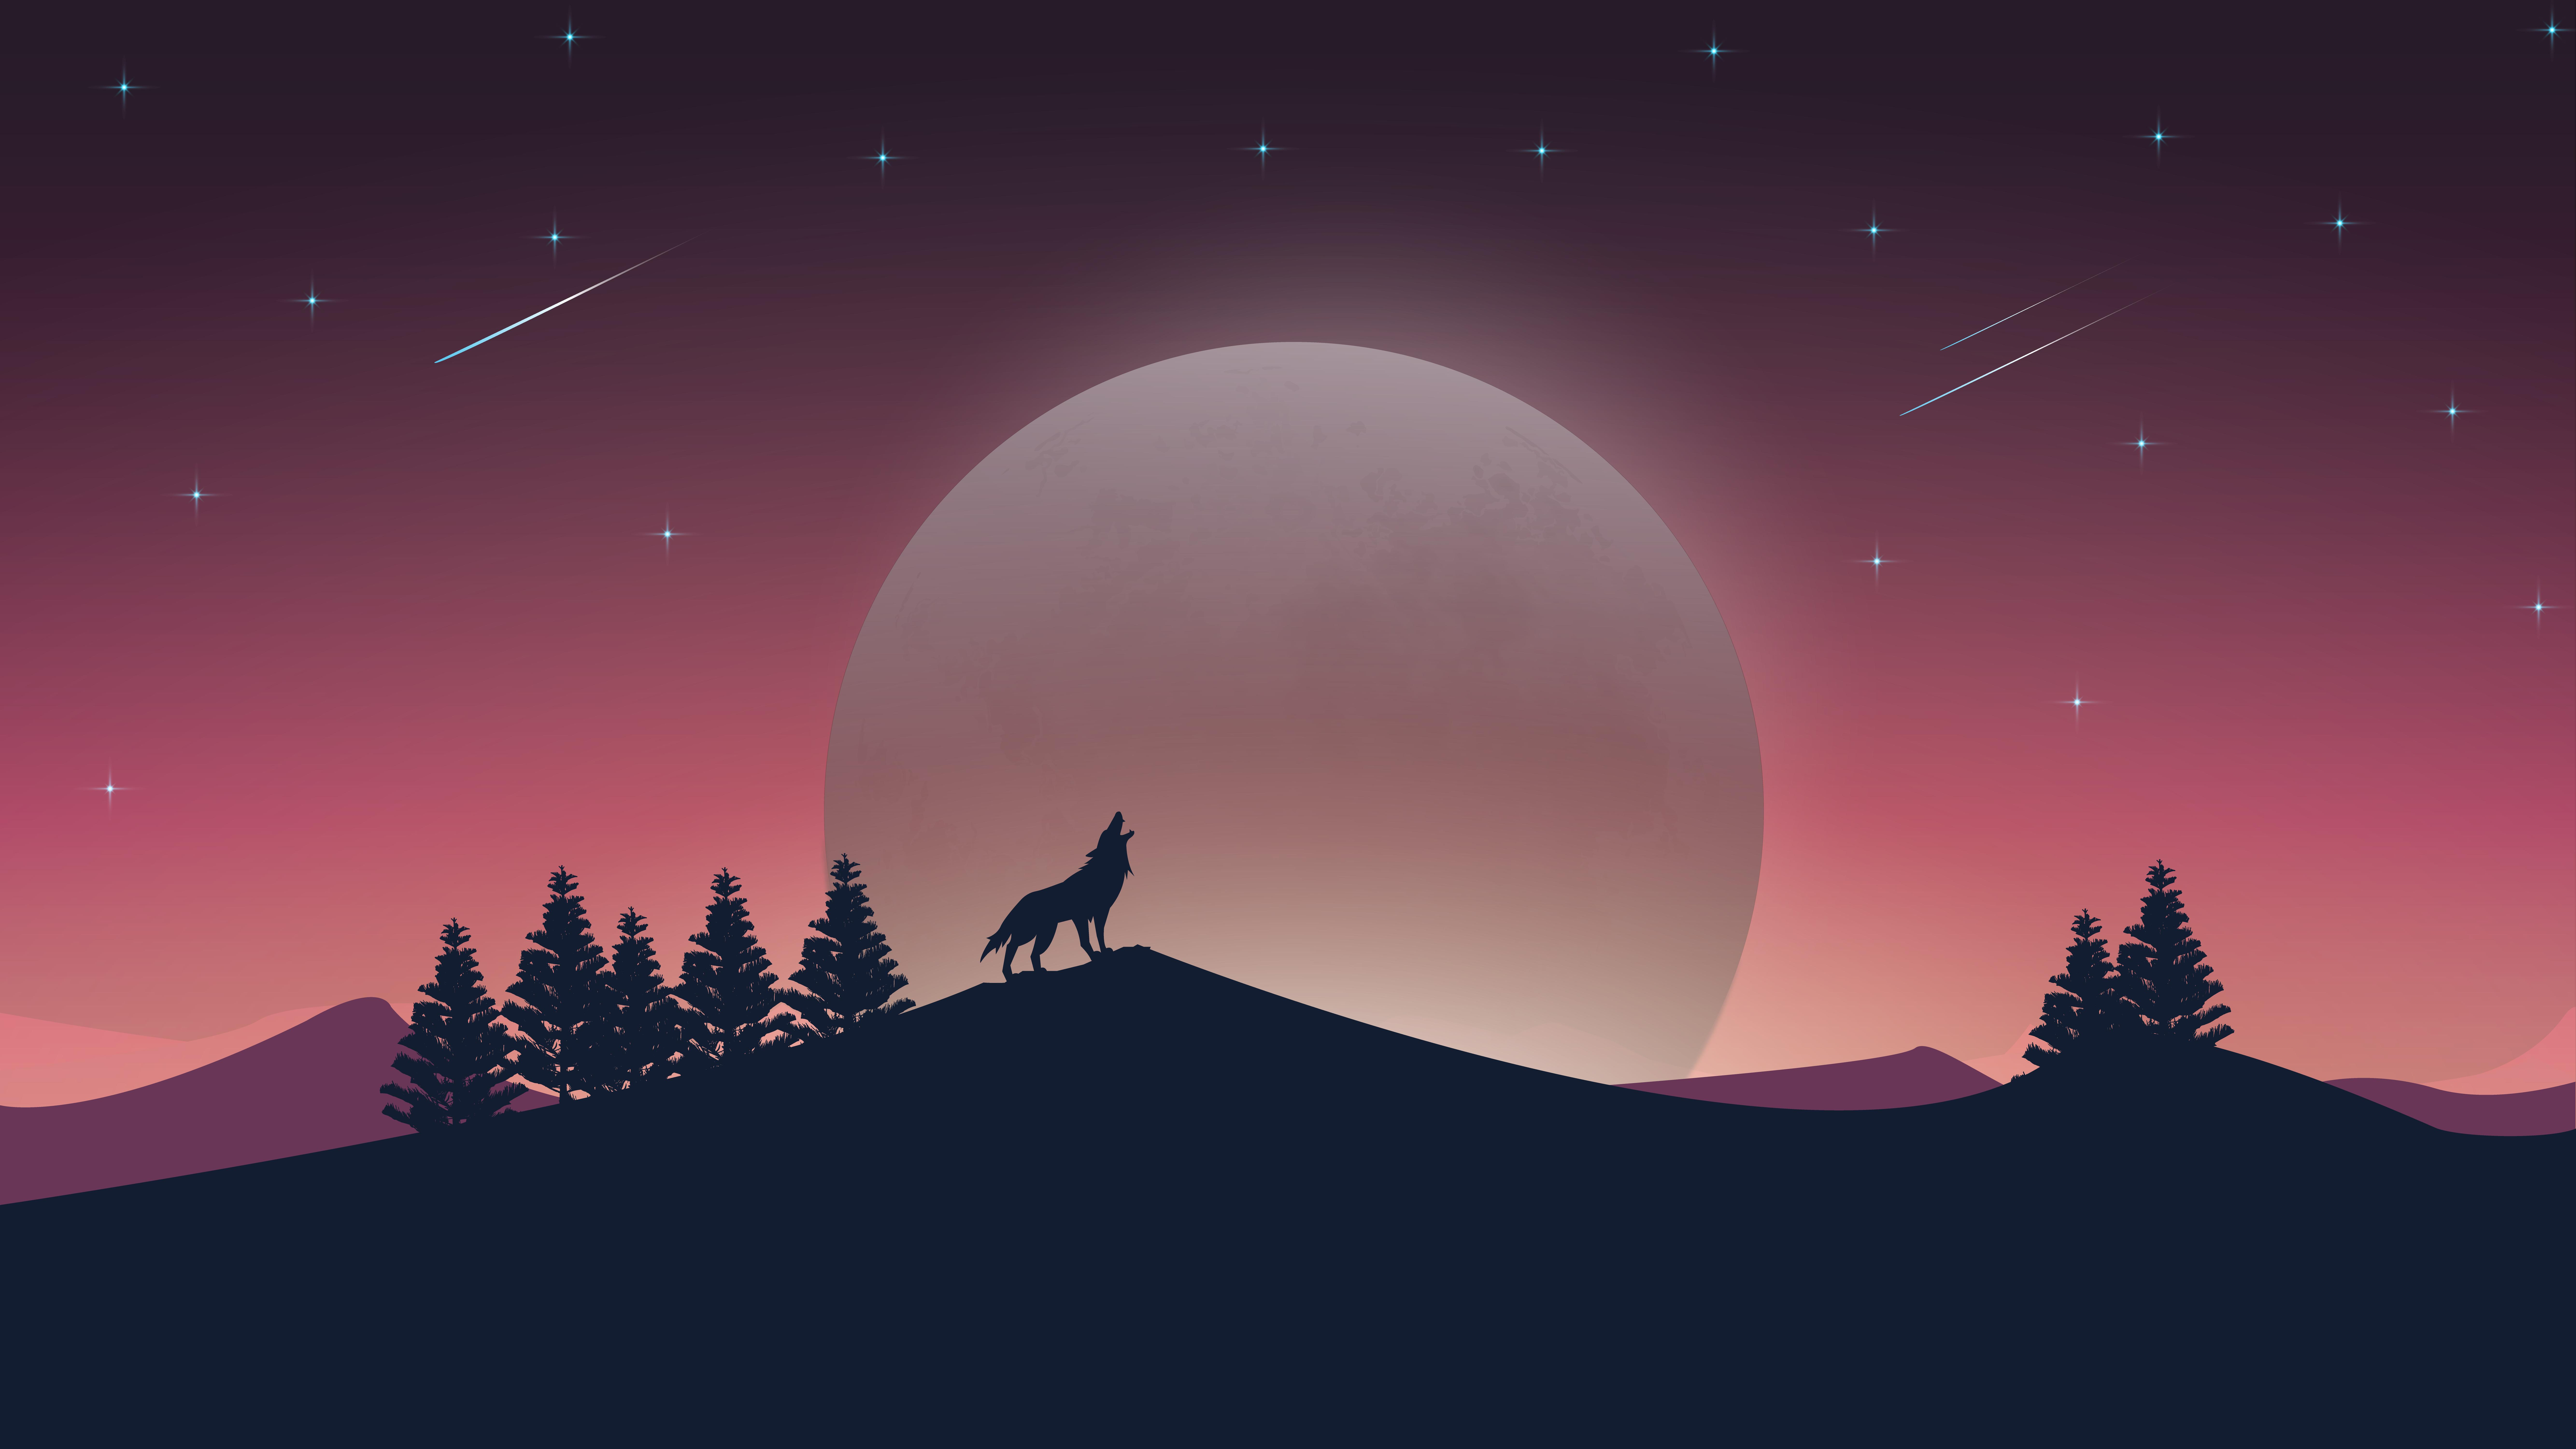 Made a wallpaper in illustrator How is it AdobeIllustrator 10667x6000